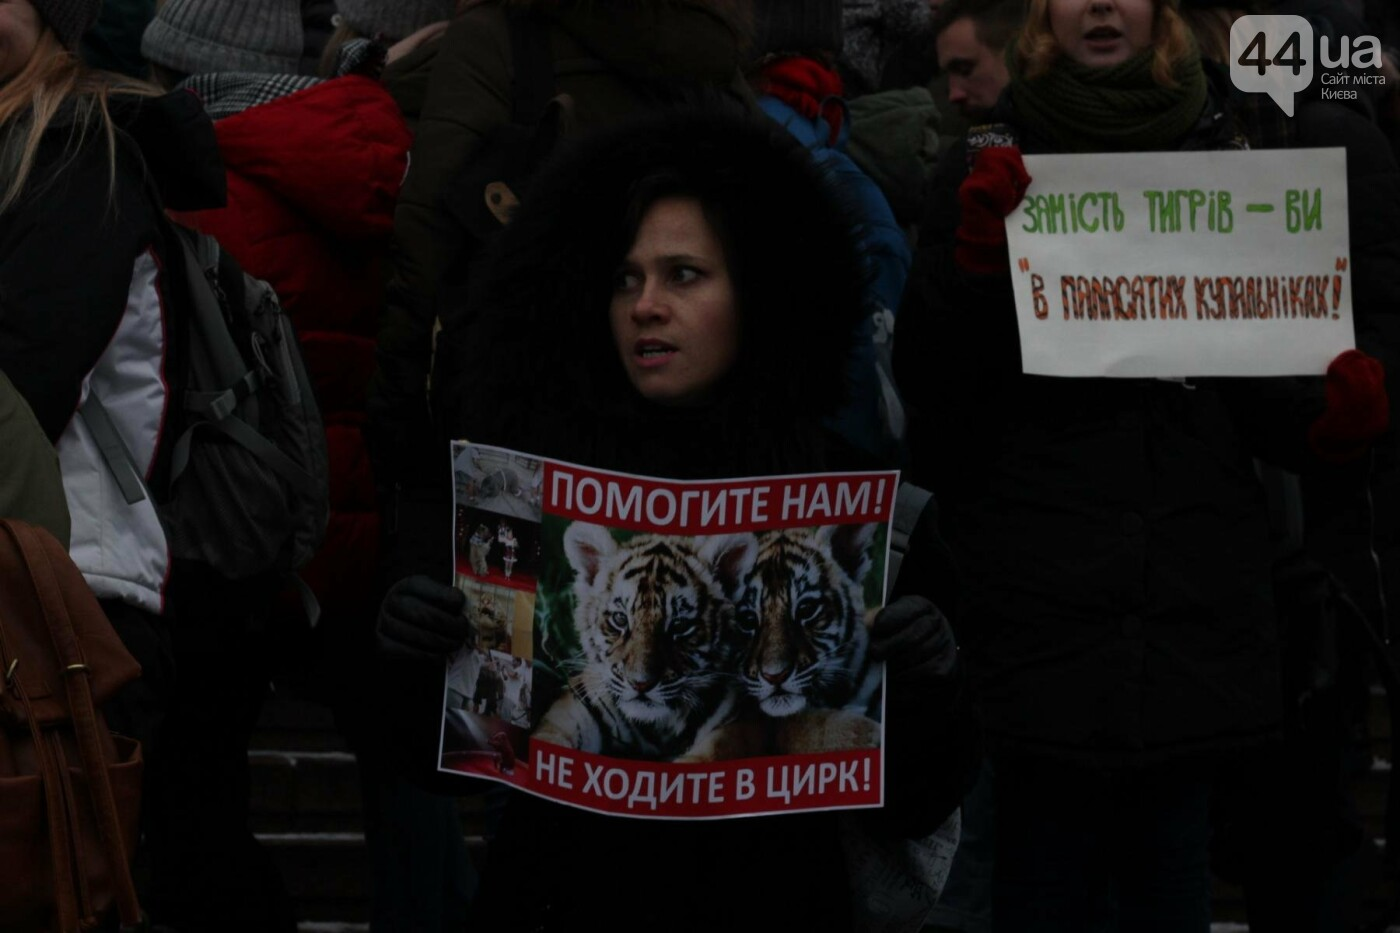 Цирк без животных: как в Киеве прошла акция протеста, фото-2